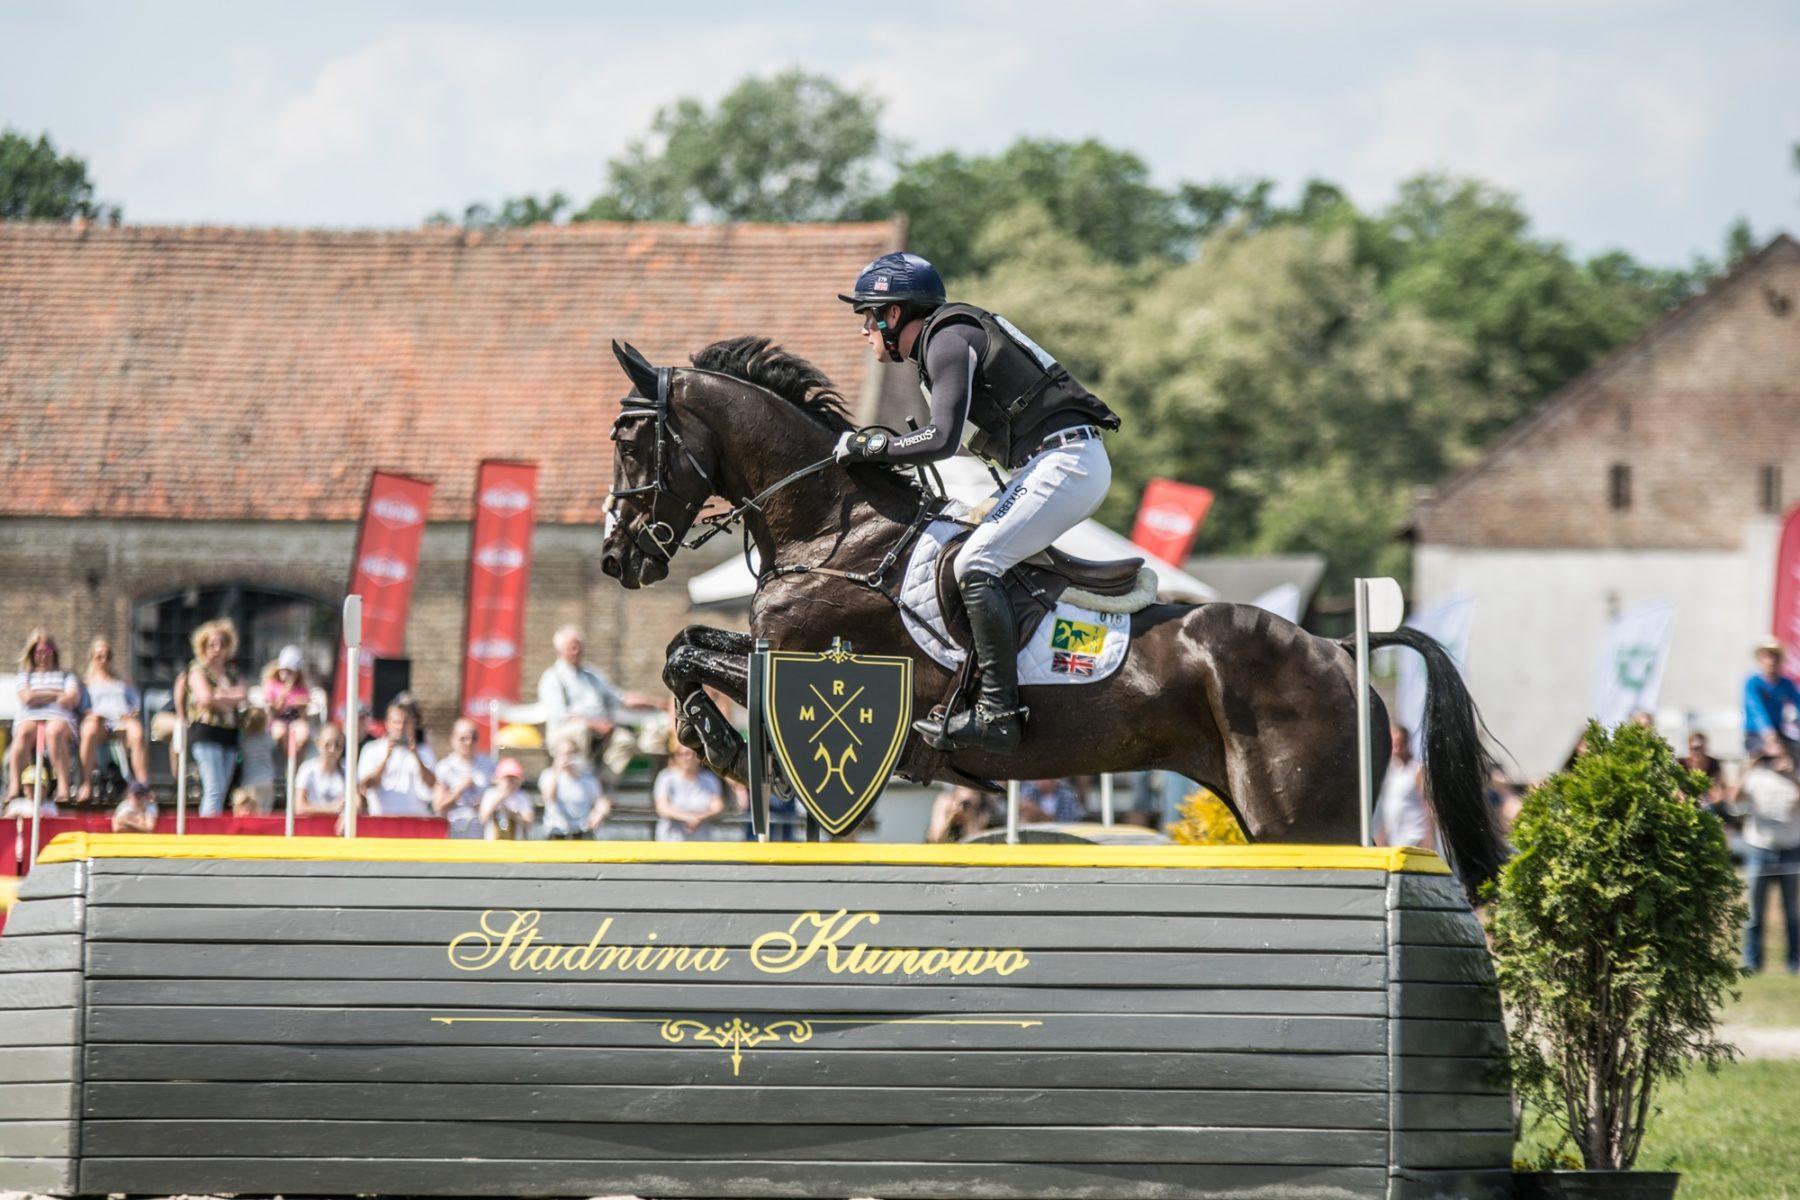 Oliver Townend (GBR) & Cillnabradden Evo